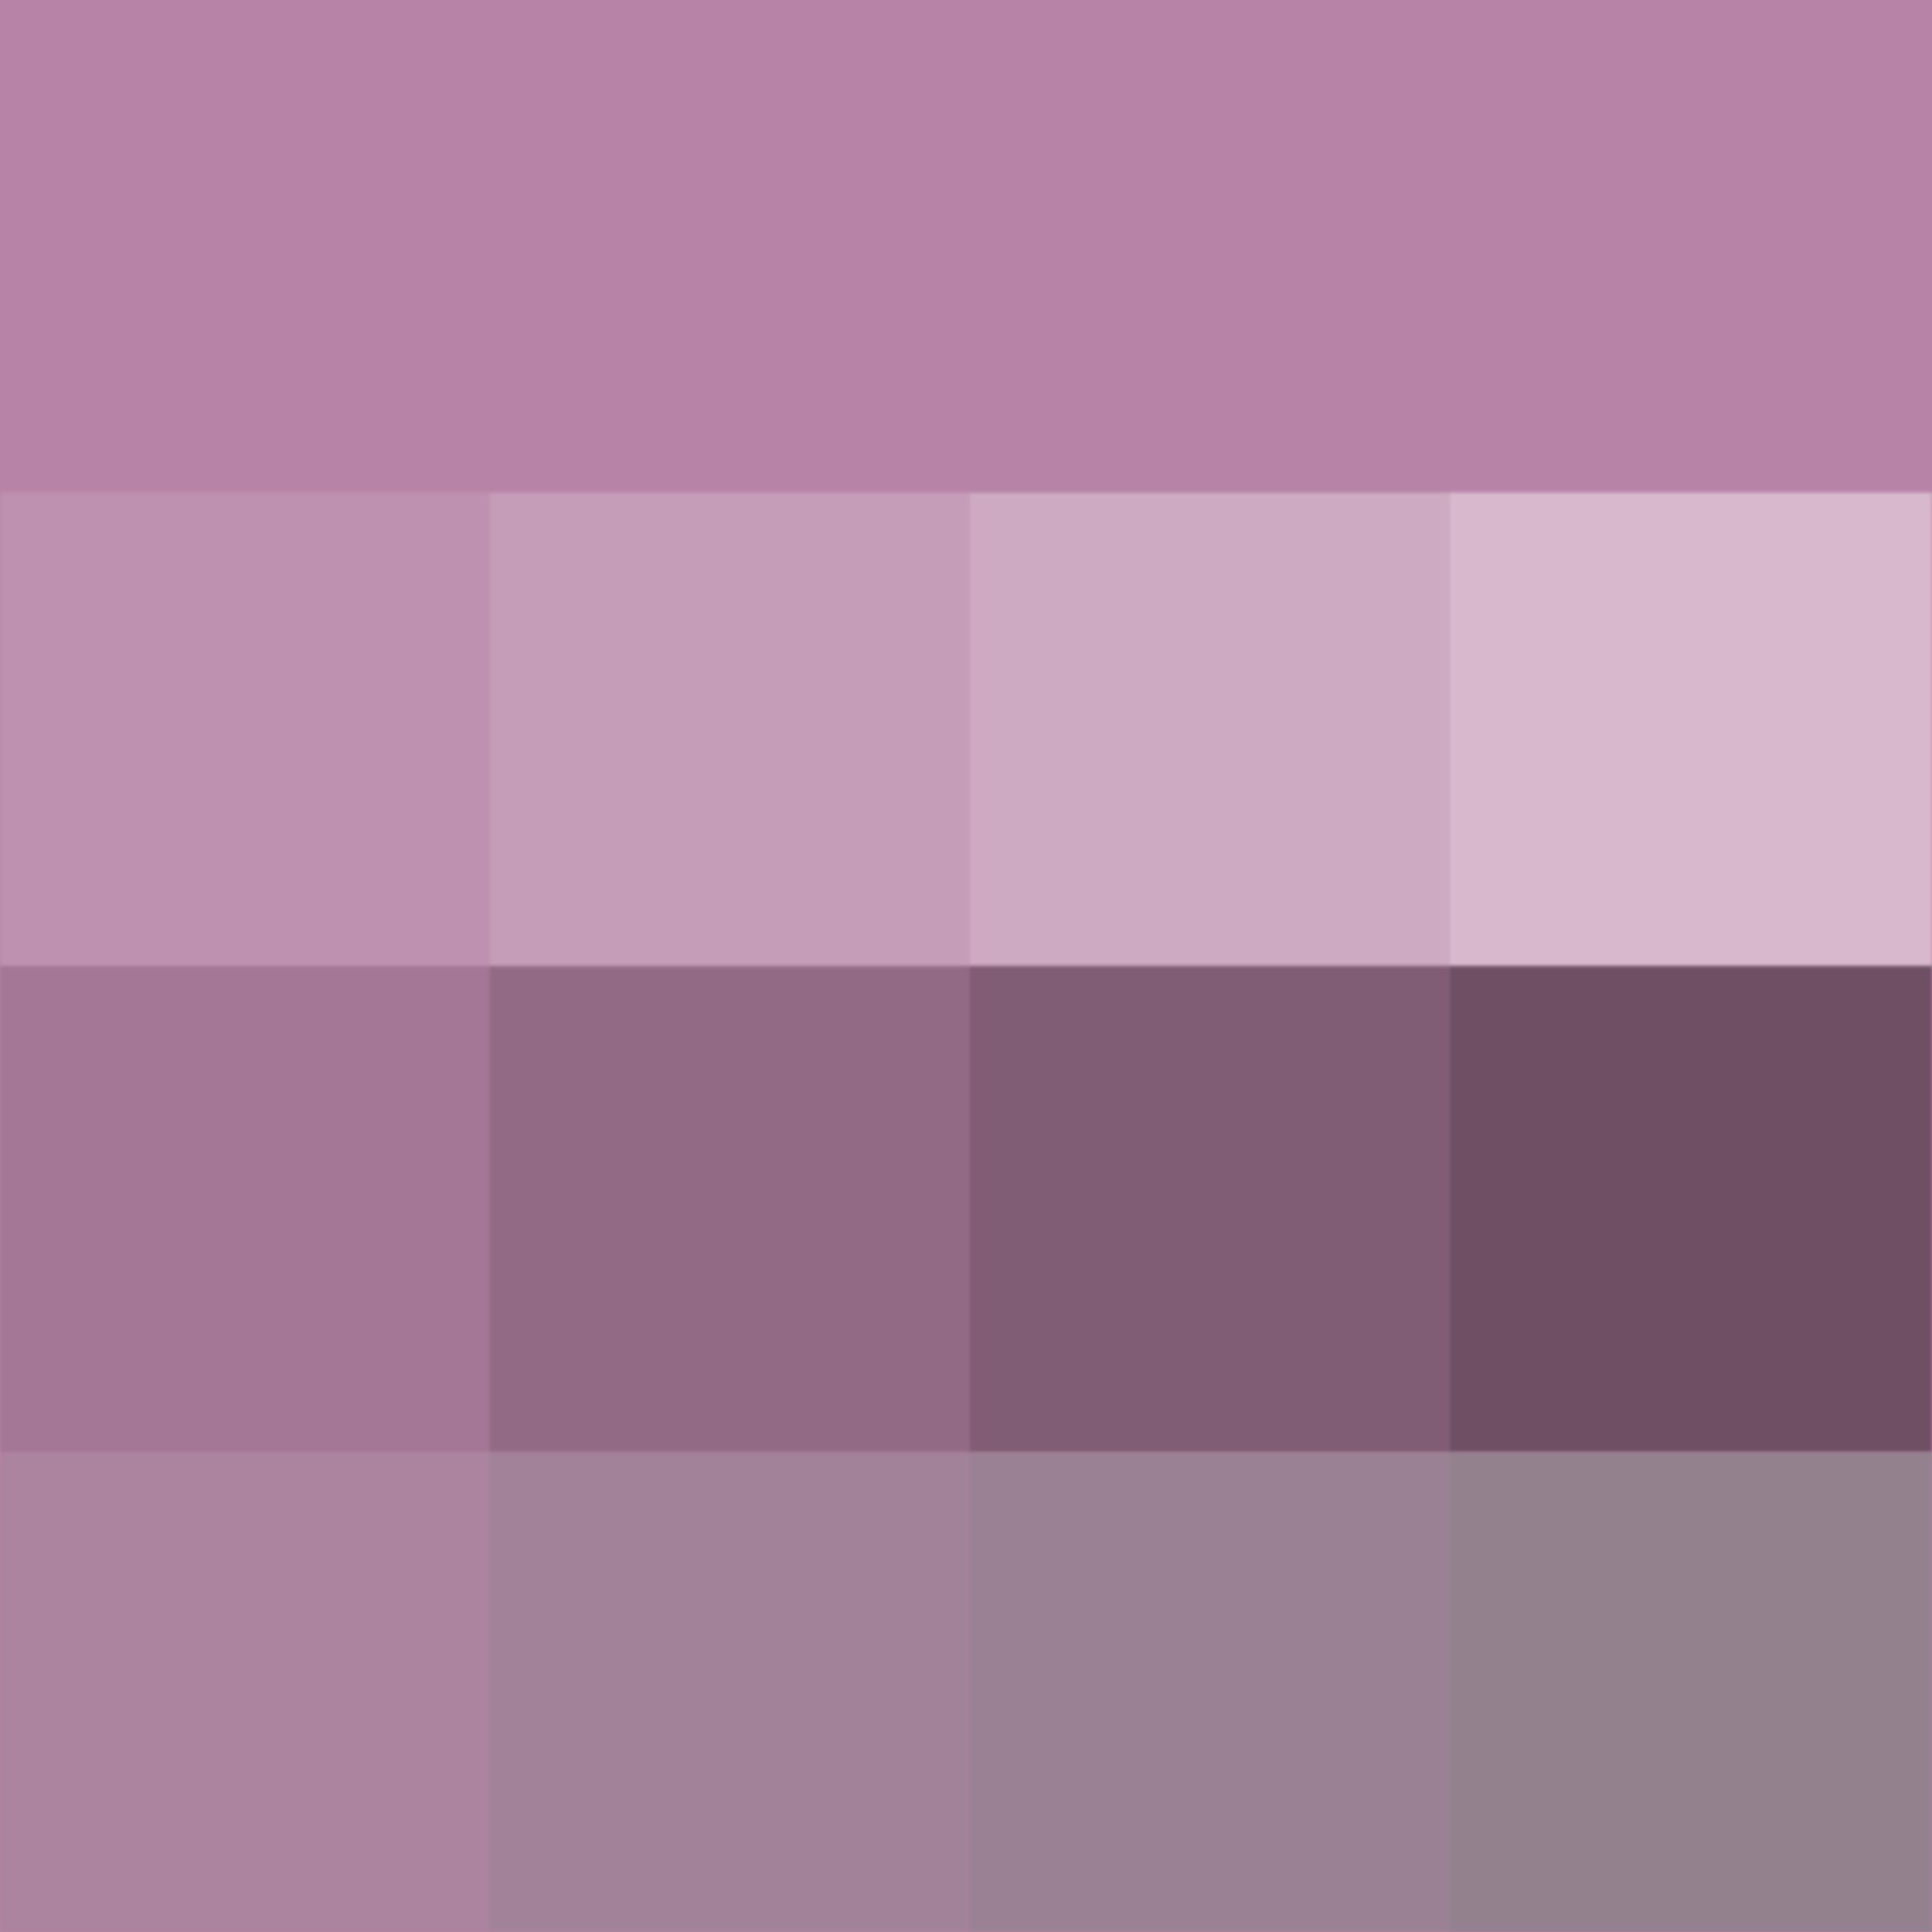 Opera #Mauve shades (Hue) ( pure color ) with Tints (hue + white